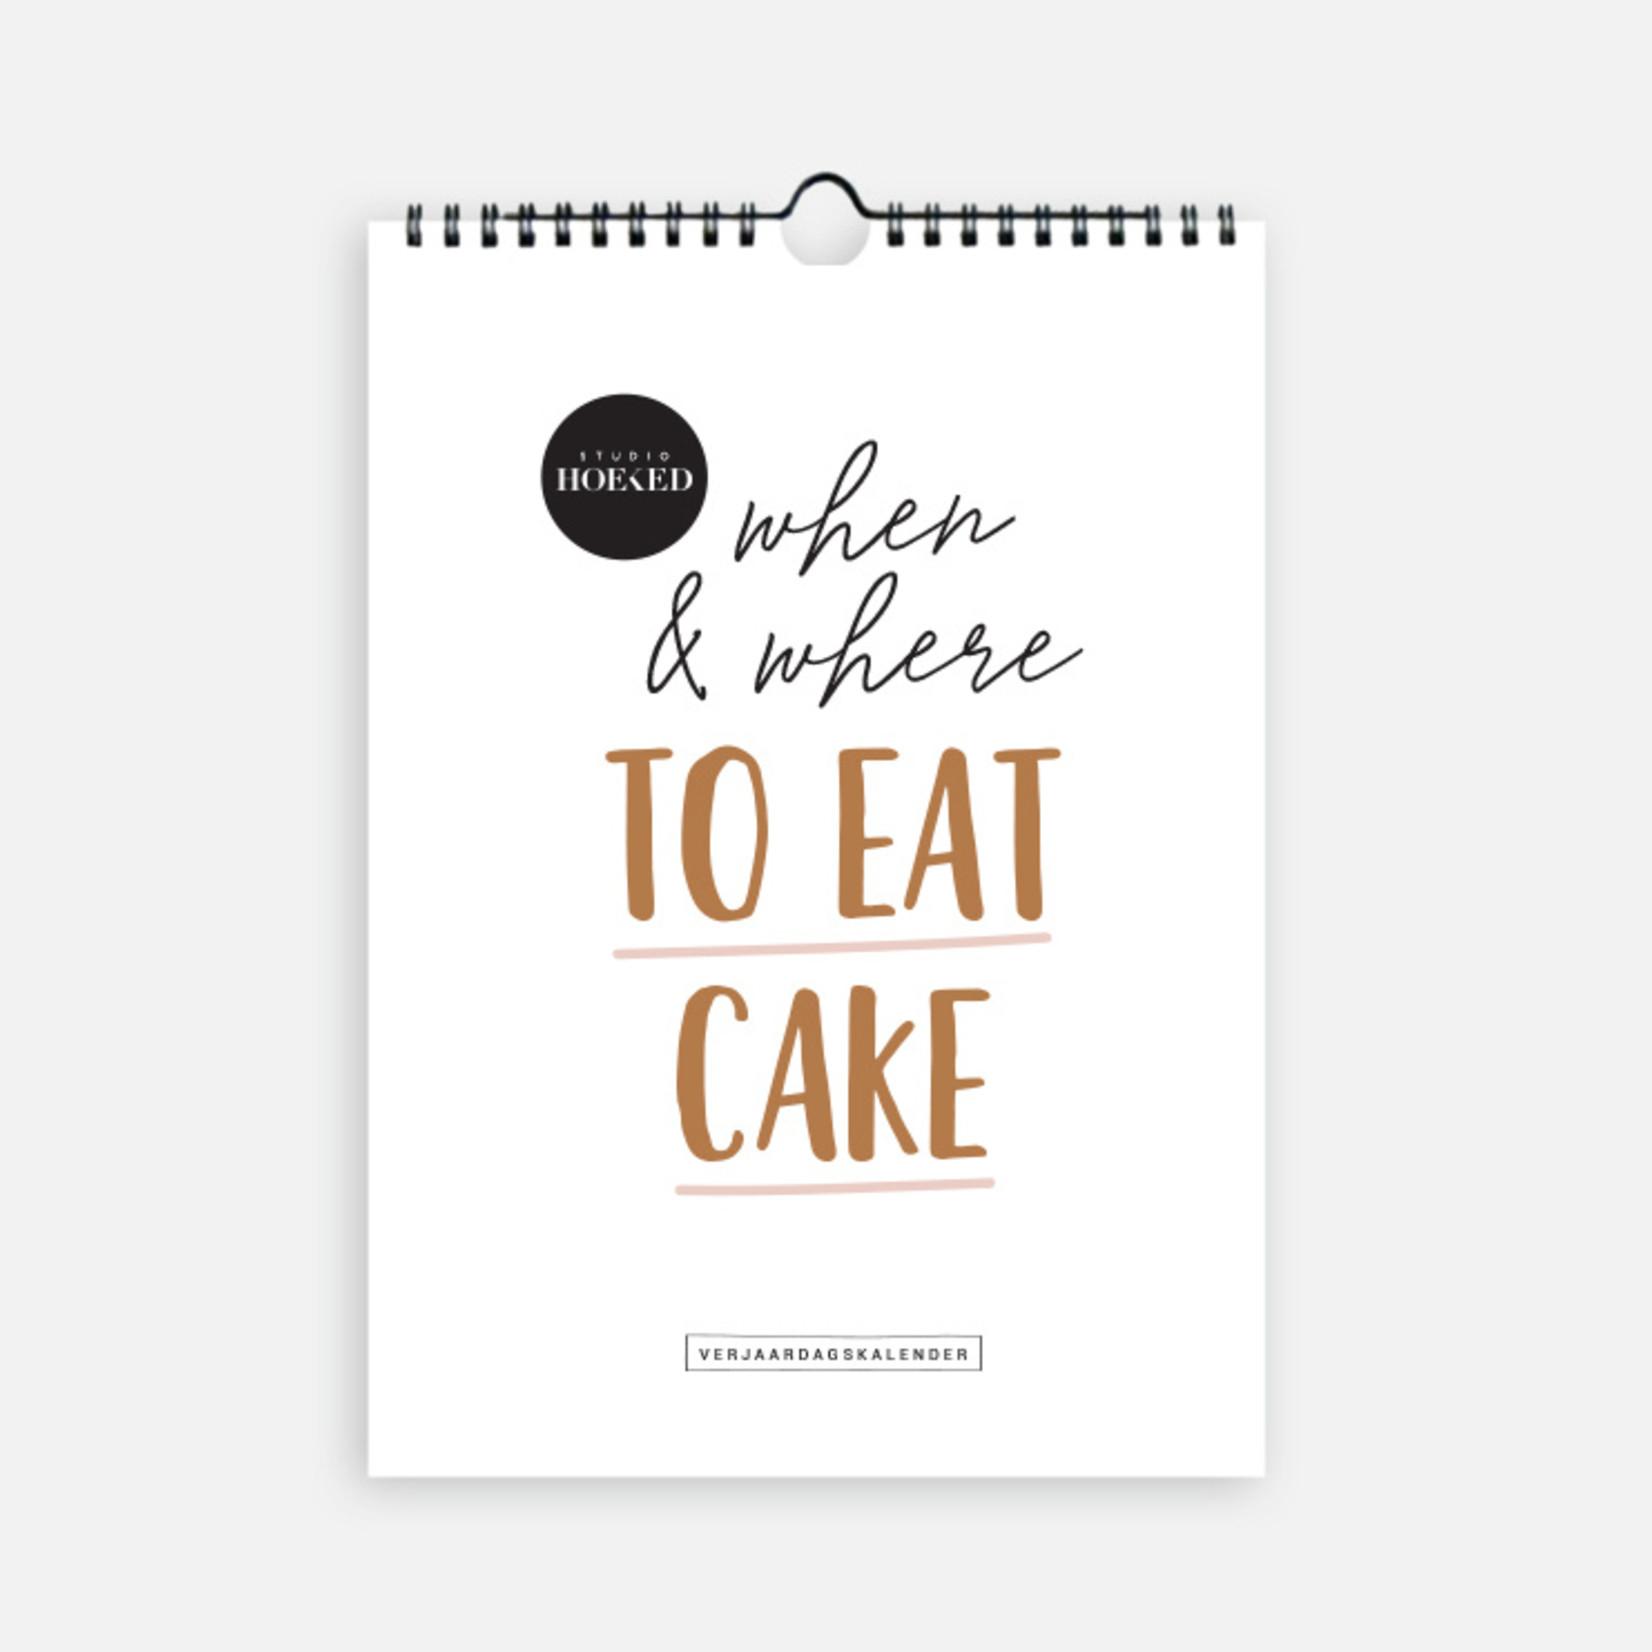 Studio Hoeked Kalender  Cake